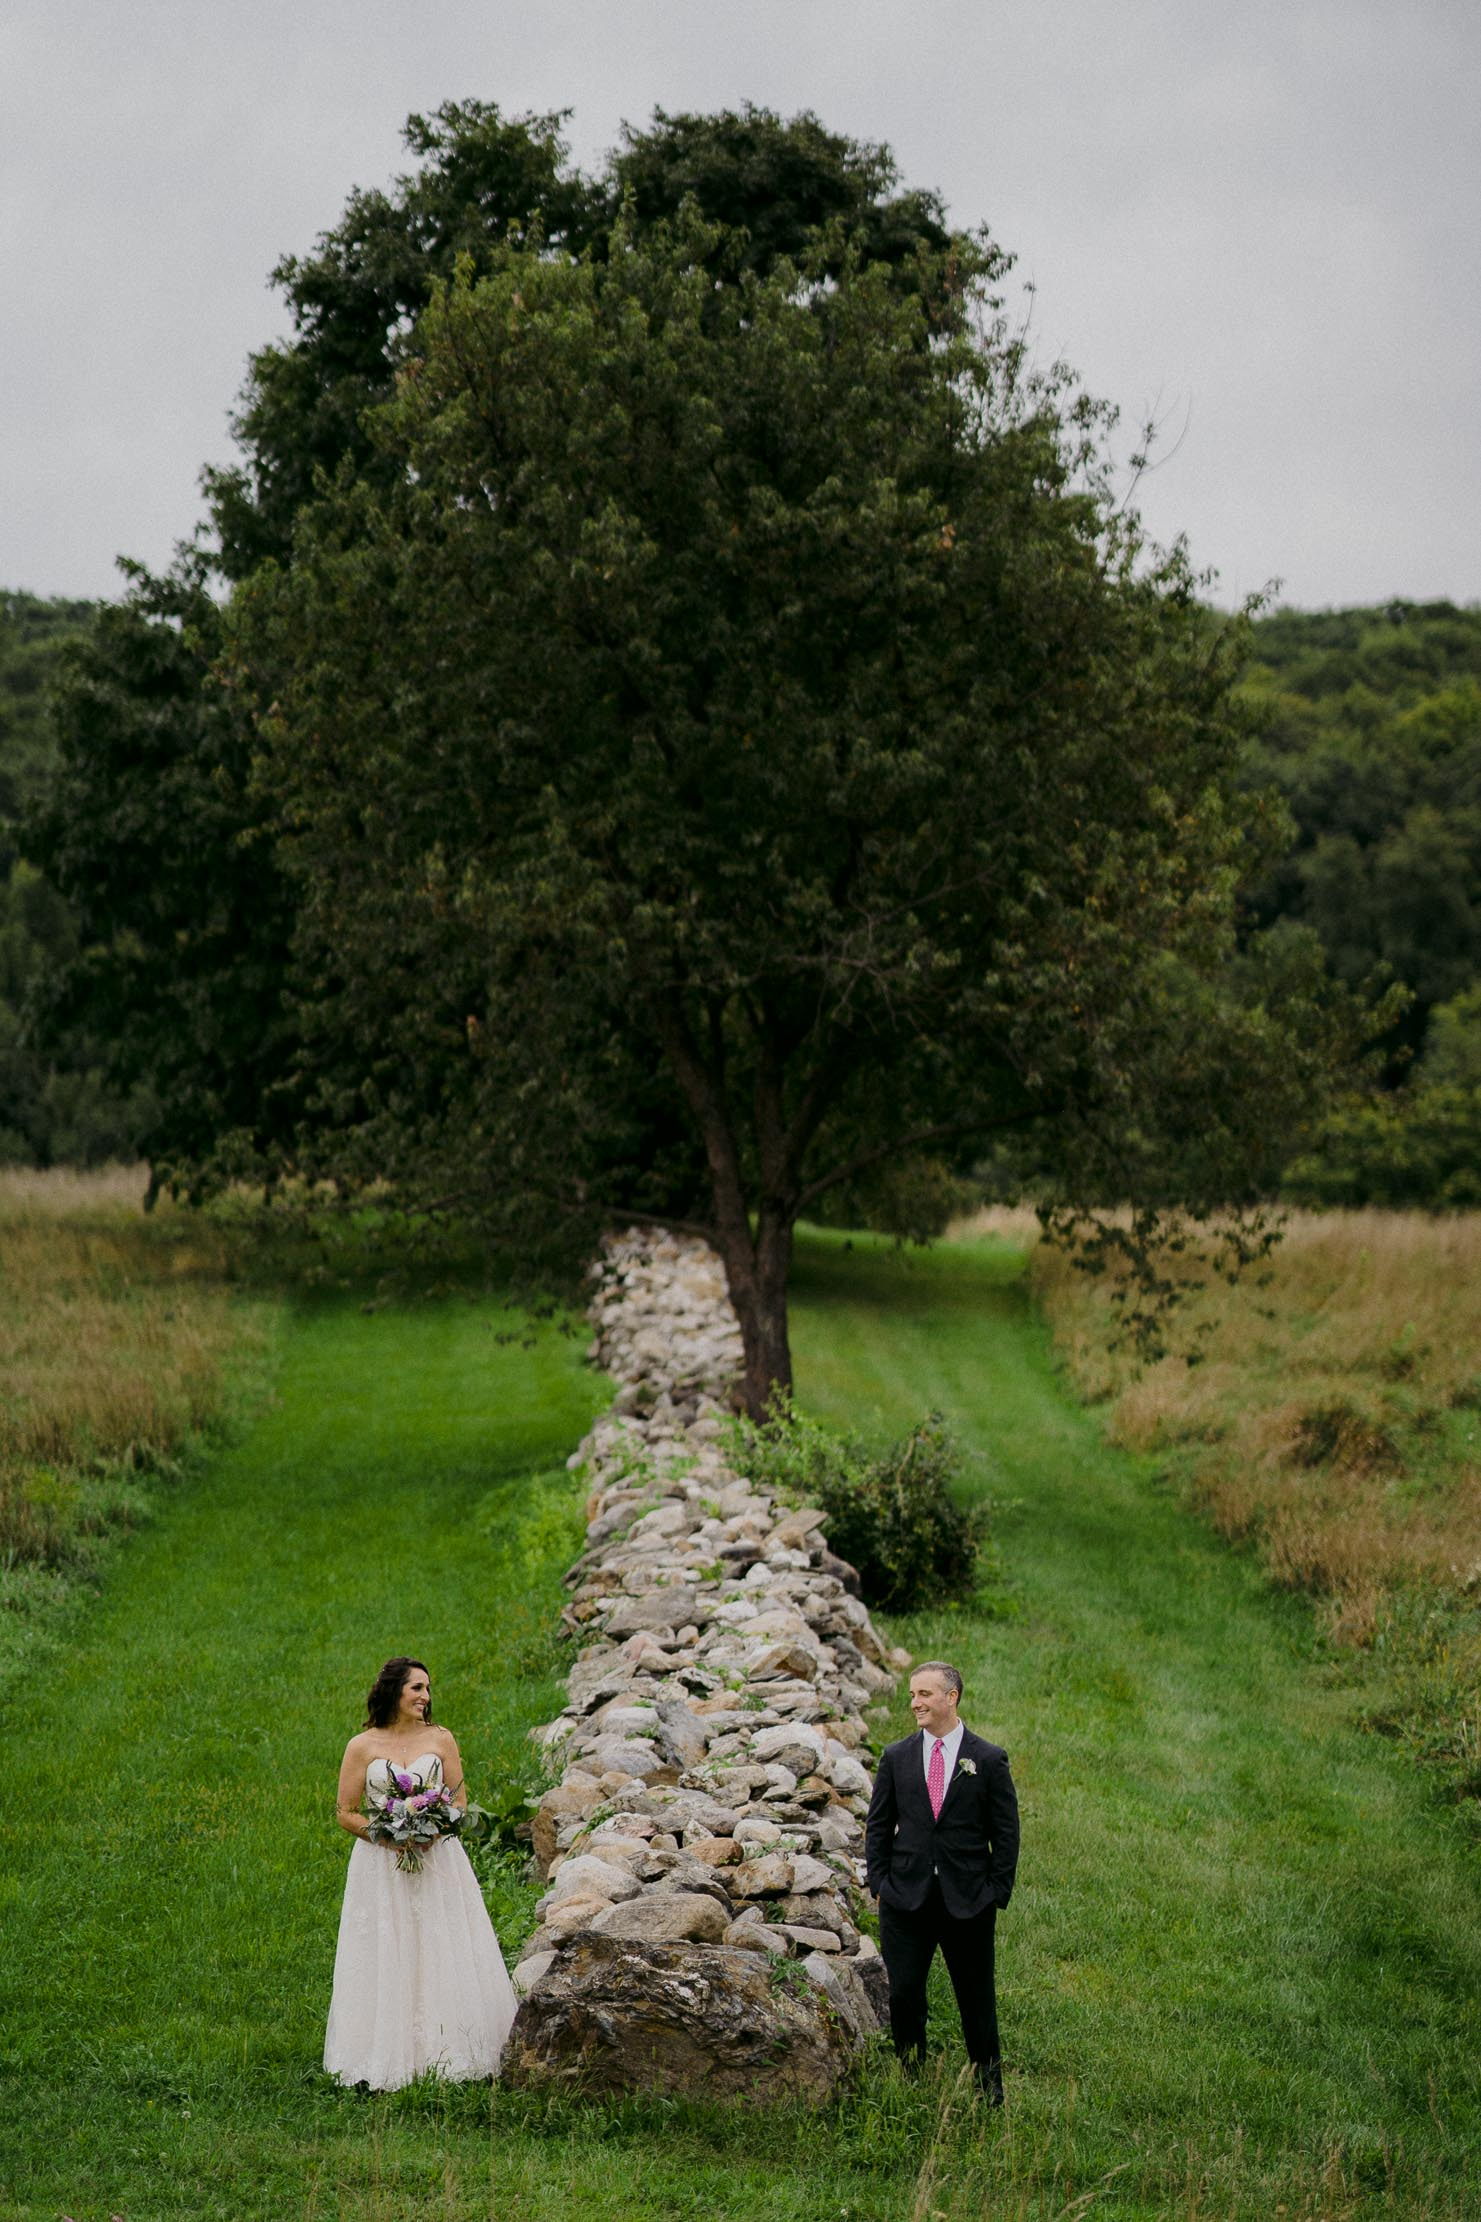 Wings-Castle-Millbrook-NY-Upstate-Wedding-Photographer-1053.jpg